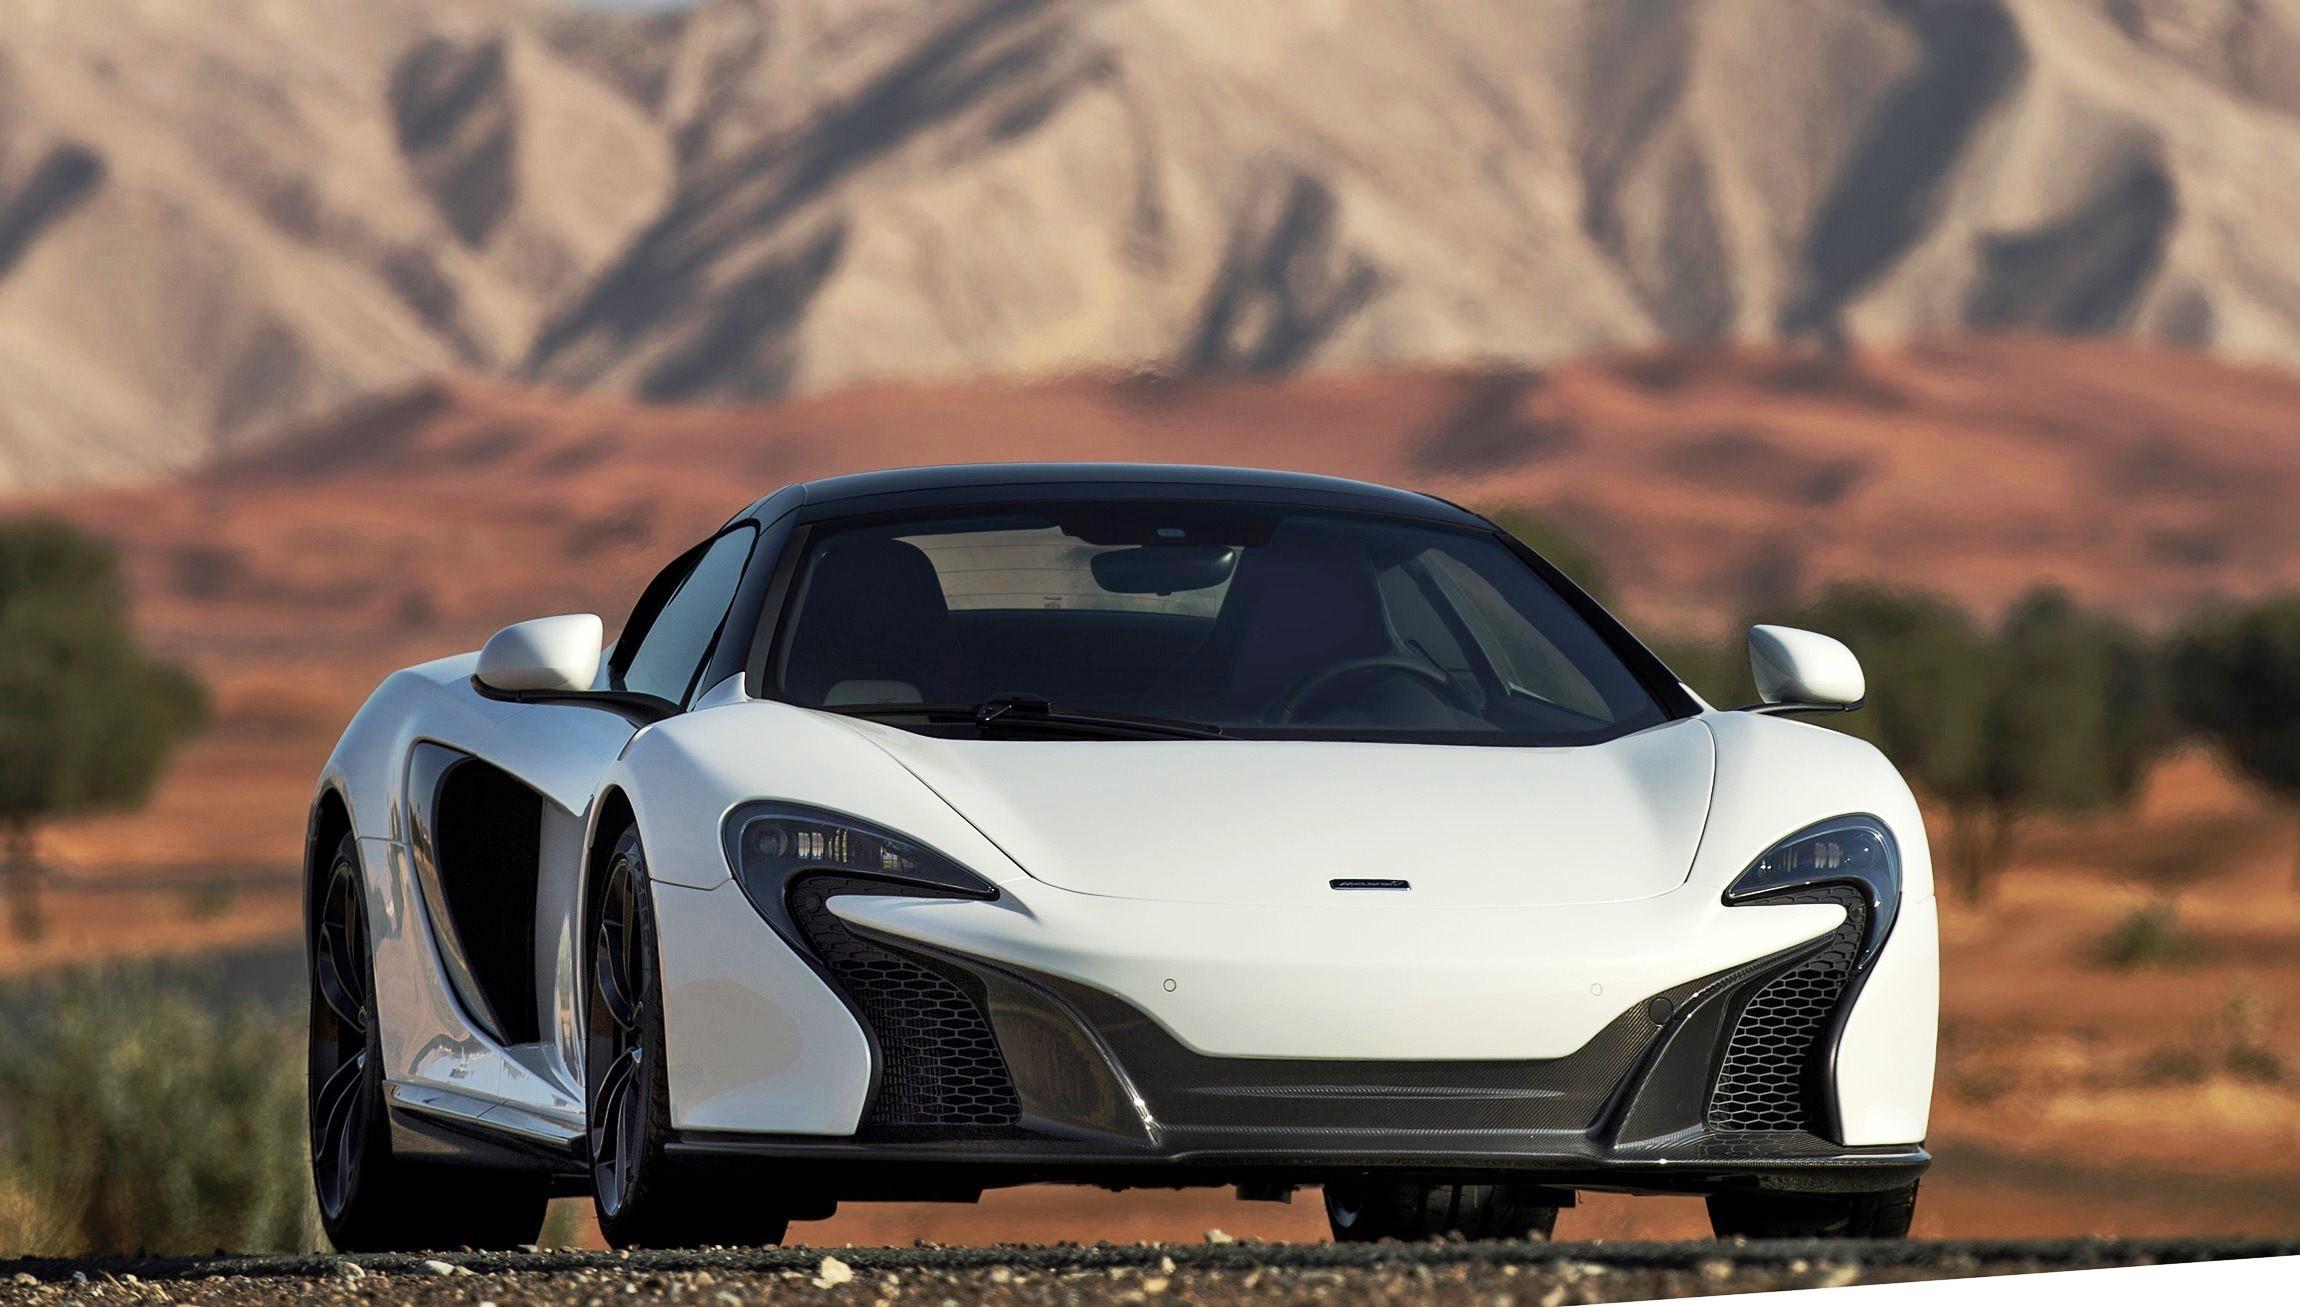 http://www.car-revs-daily.com/wp-content/uploads/2015/11/2016-McLaren-650S-Spider-Al-Sahara-79-by-MSO-9.jpg